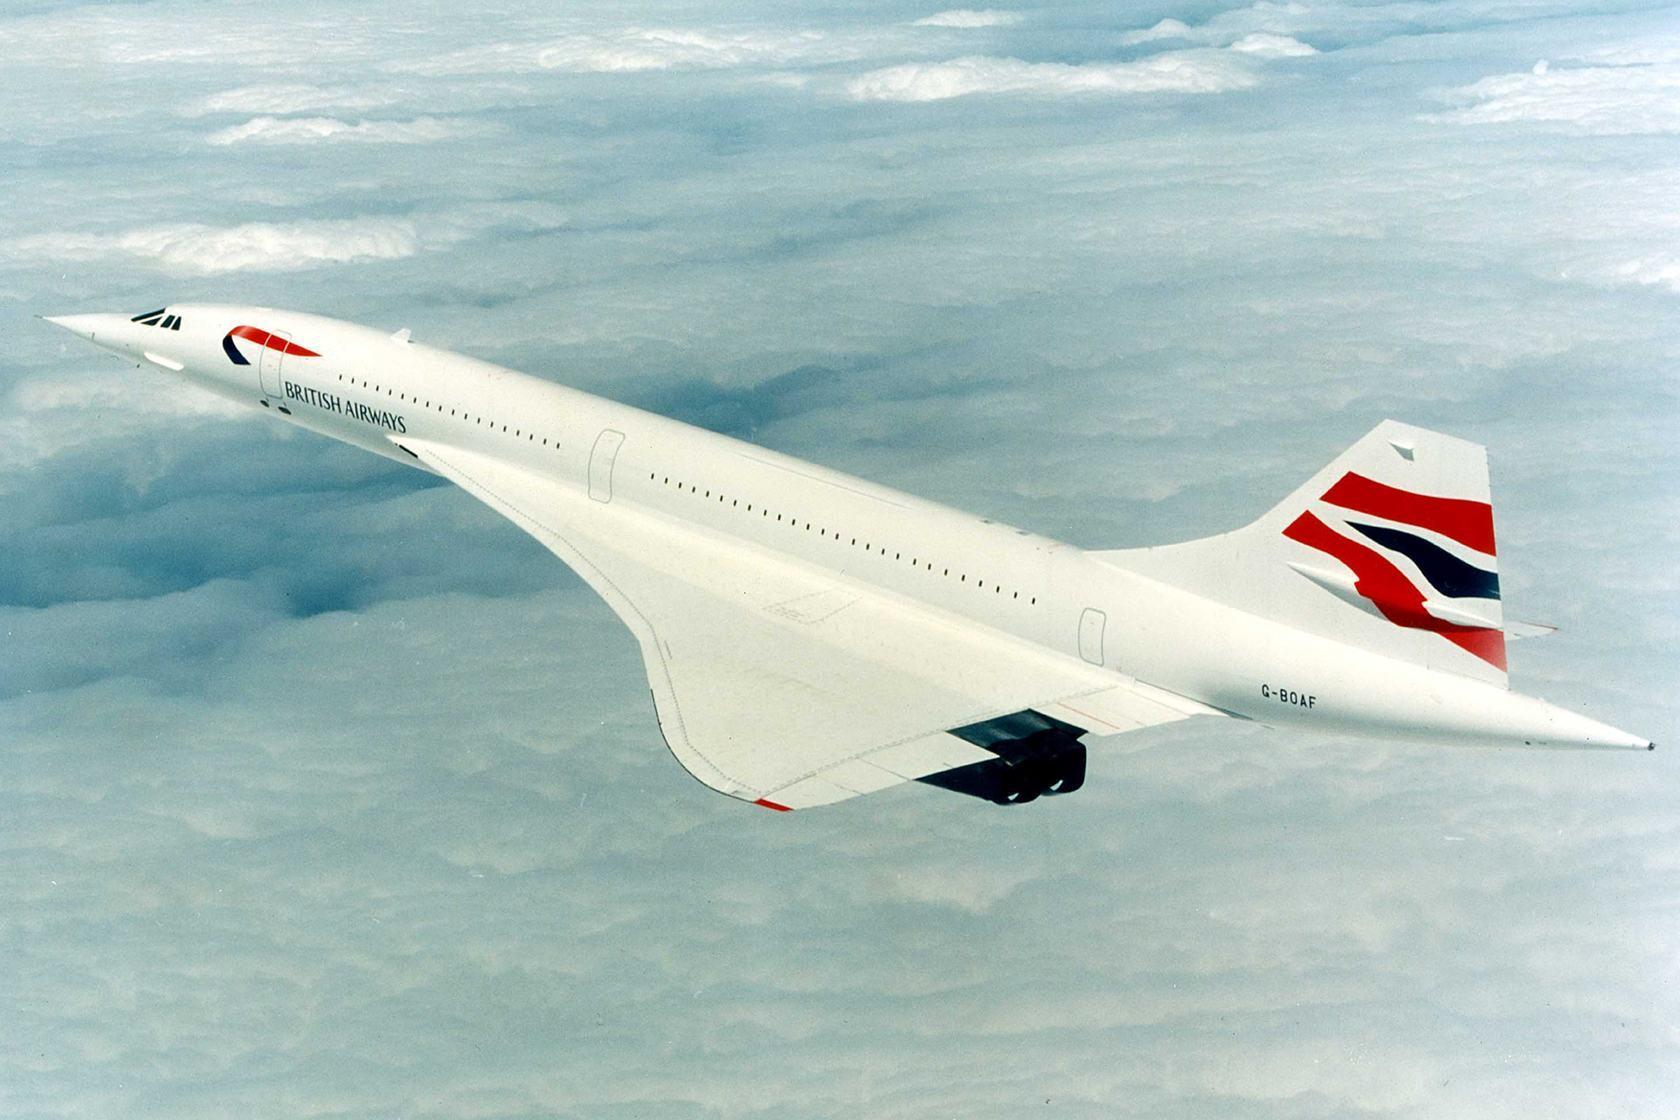 Primeiro voo comercial do Concorde - Estudo Prático